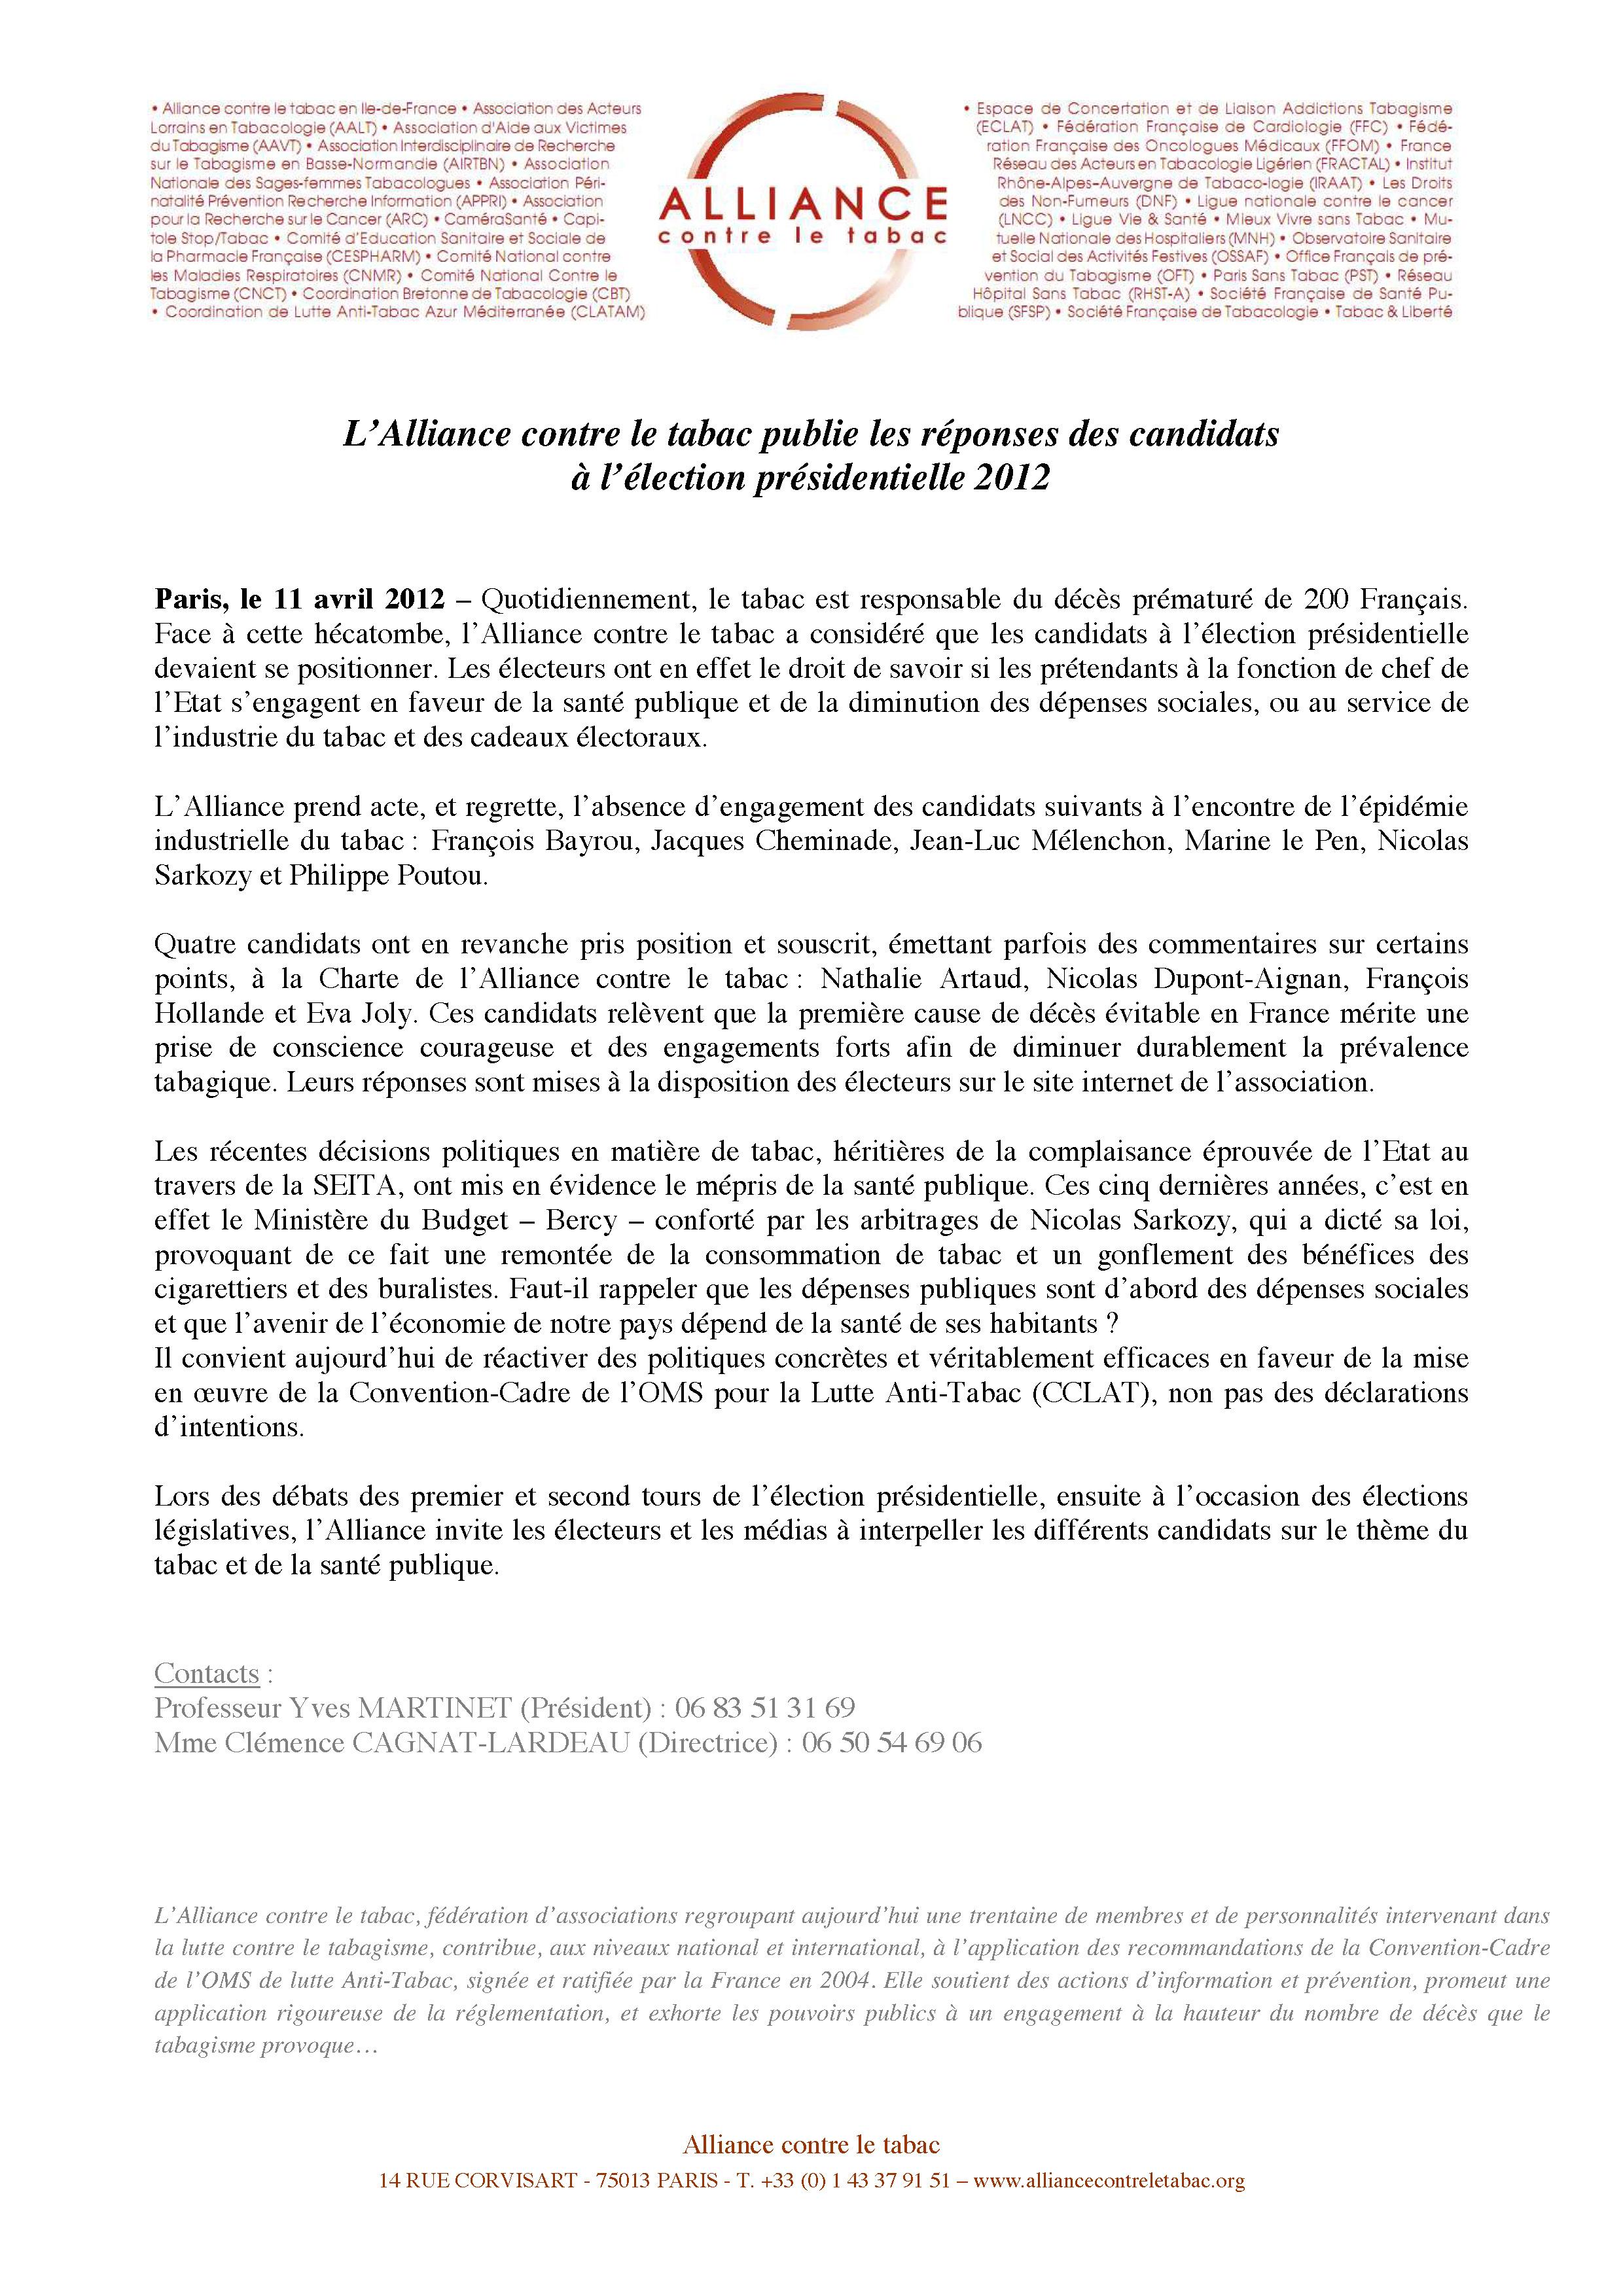 Alliance-CP_conference-de presse-11avr2012.jpg